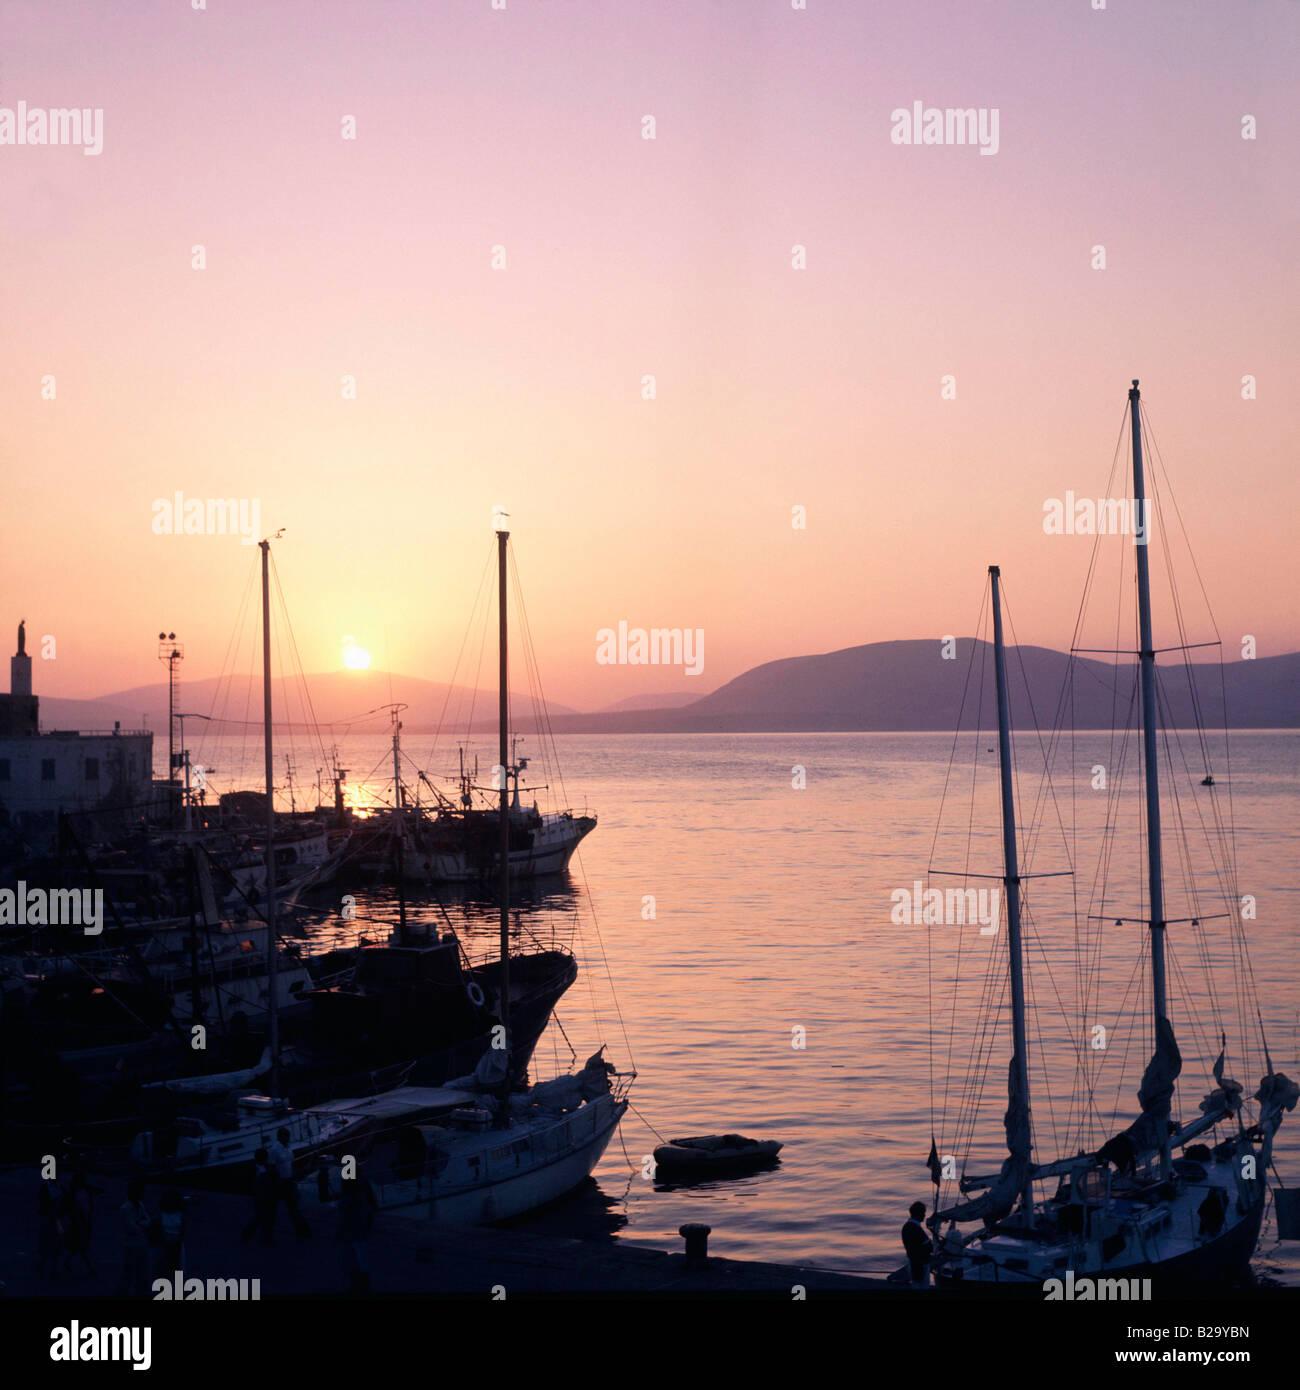 SARDINIA Alghero Harbour at Sunset Date 10 06 2008 Ref UKH025558 0001 COMPULSORY CREDIT World Pictures Photoshot - Stock Image